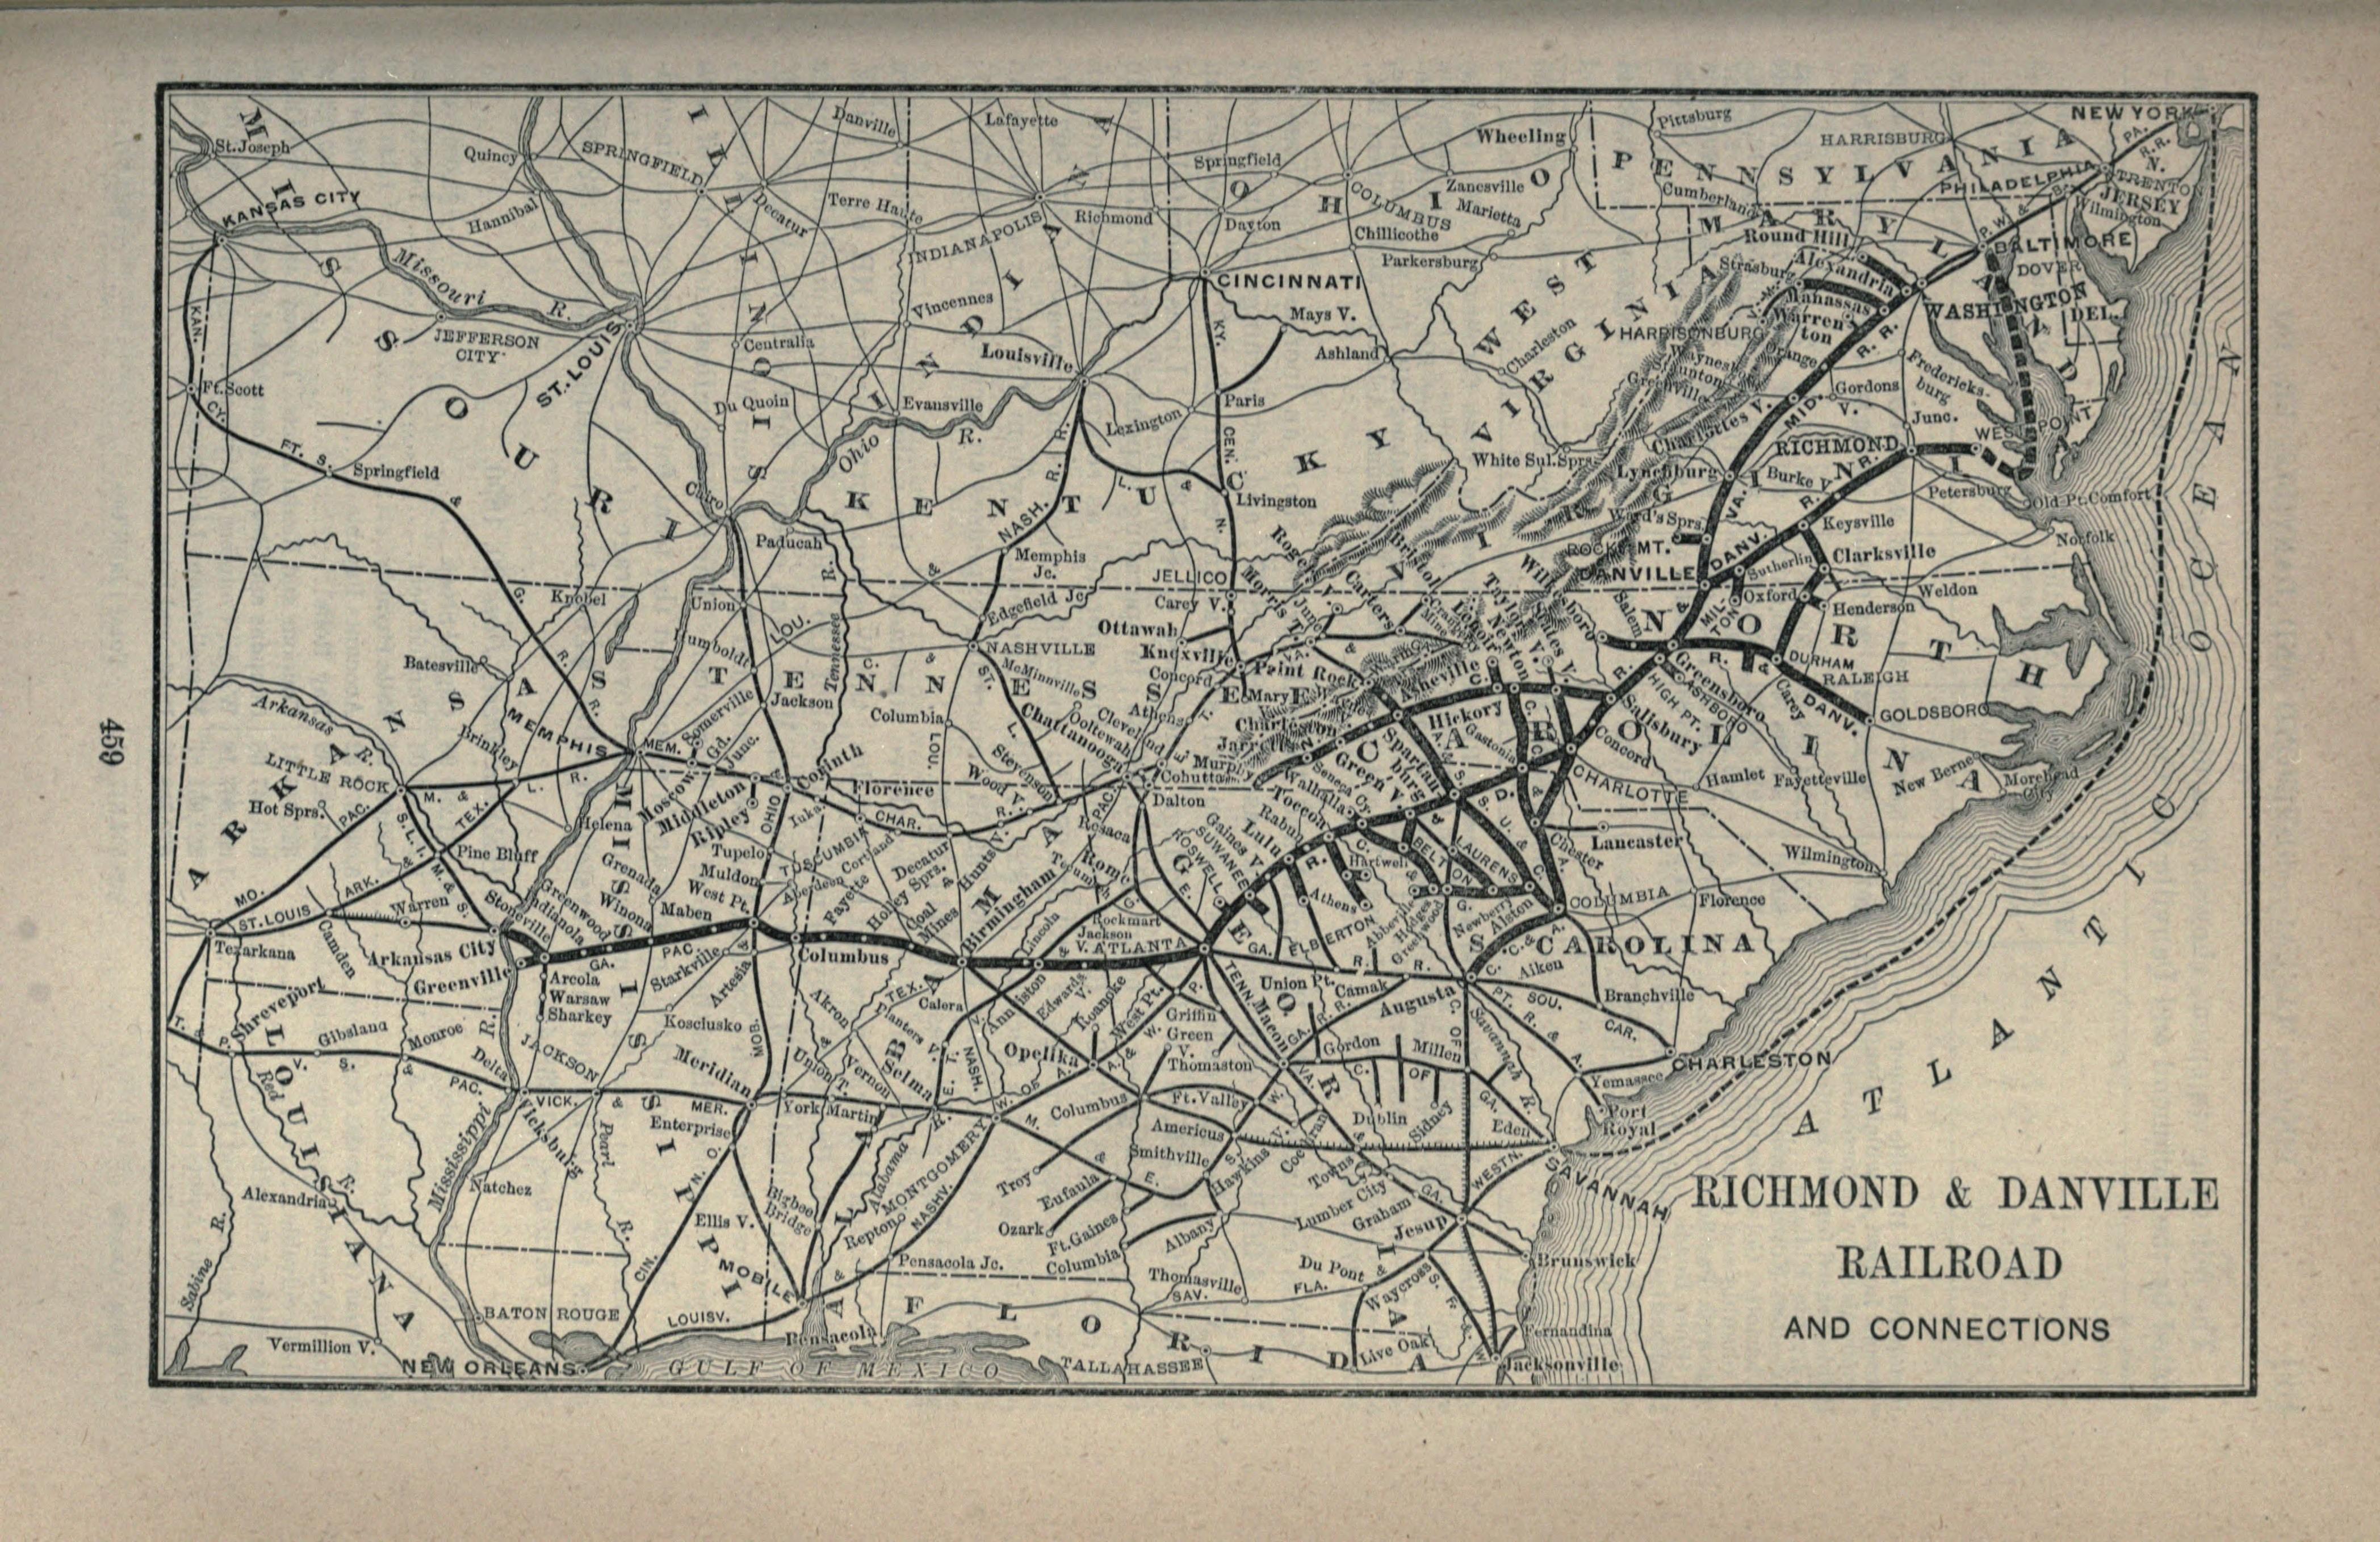 Richmond And Danville Railroad Wikiwand - Us railroad map 1865